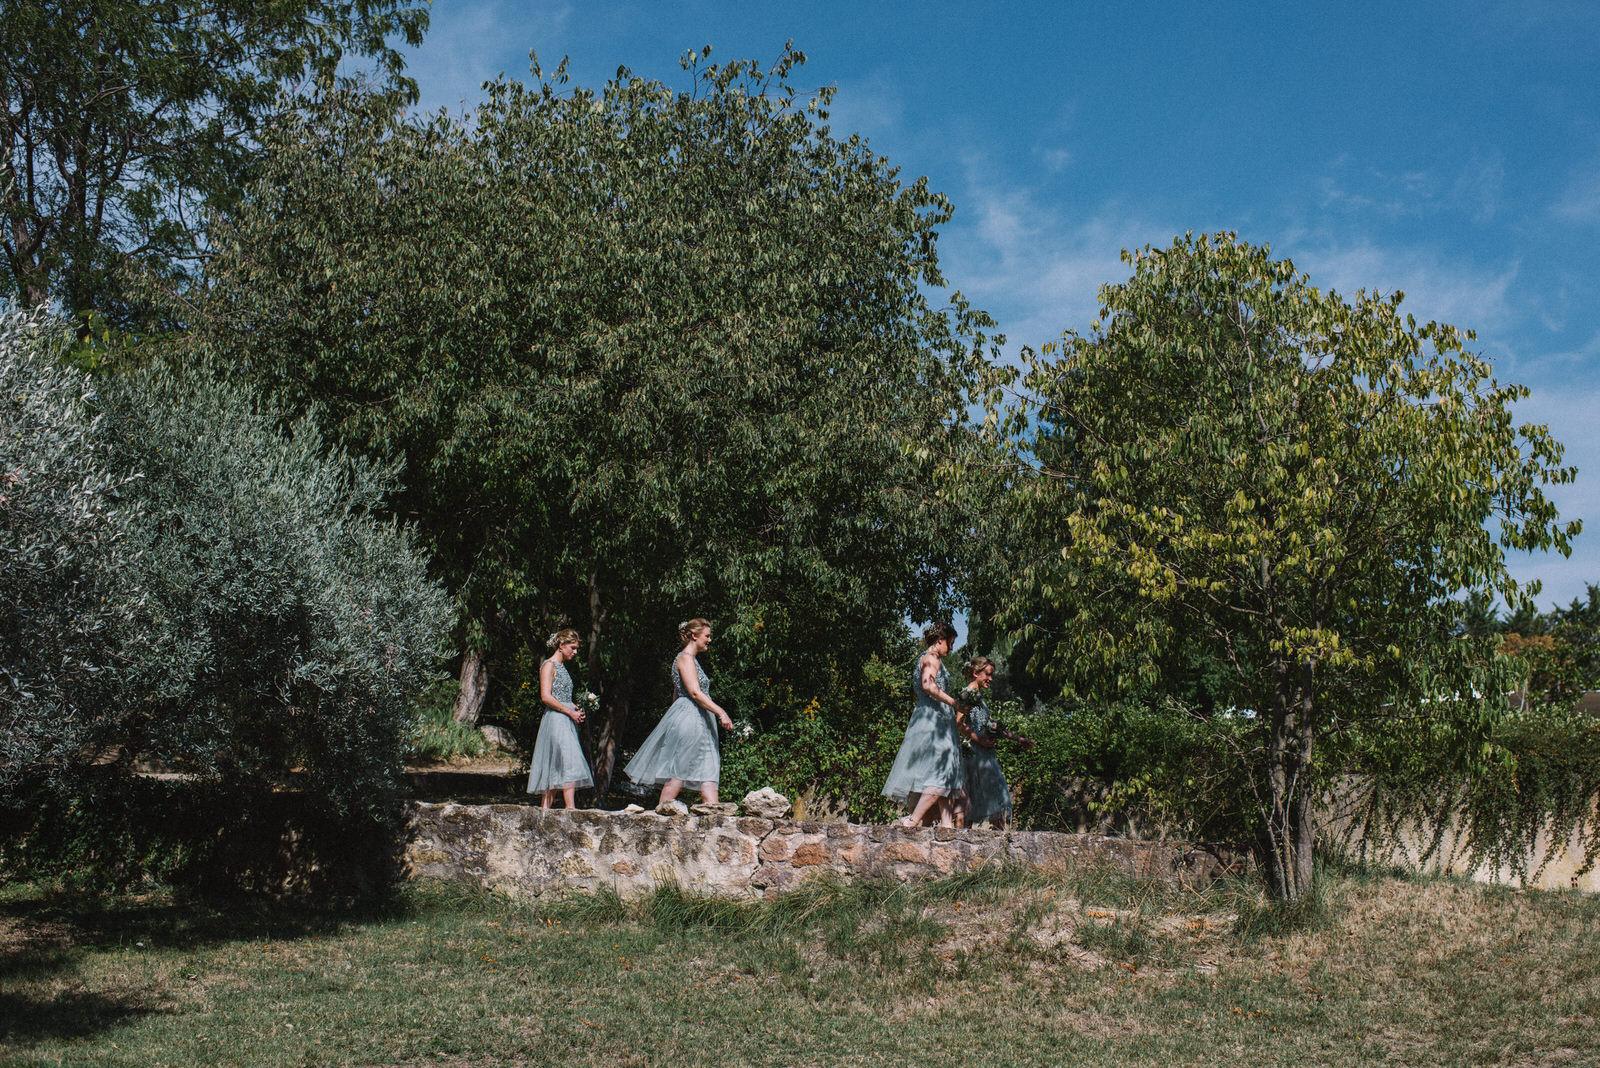 011-LOURMARIN-WEDDING-PHOTOGRAPHER-PROVENCE-WEDDING-ALTERNATIVE-WEDDING-PHOTOGRAPHY-FRANCE-PROVENCE-GARDEN-WEDDING.JPG